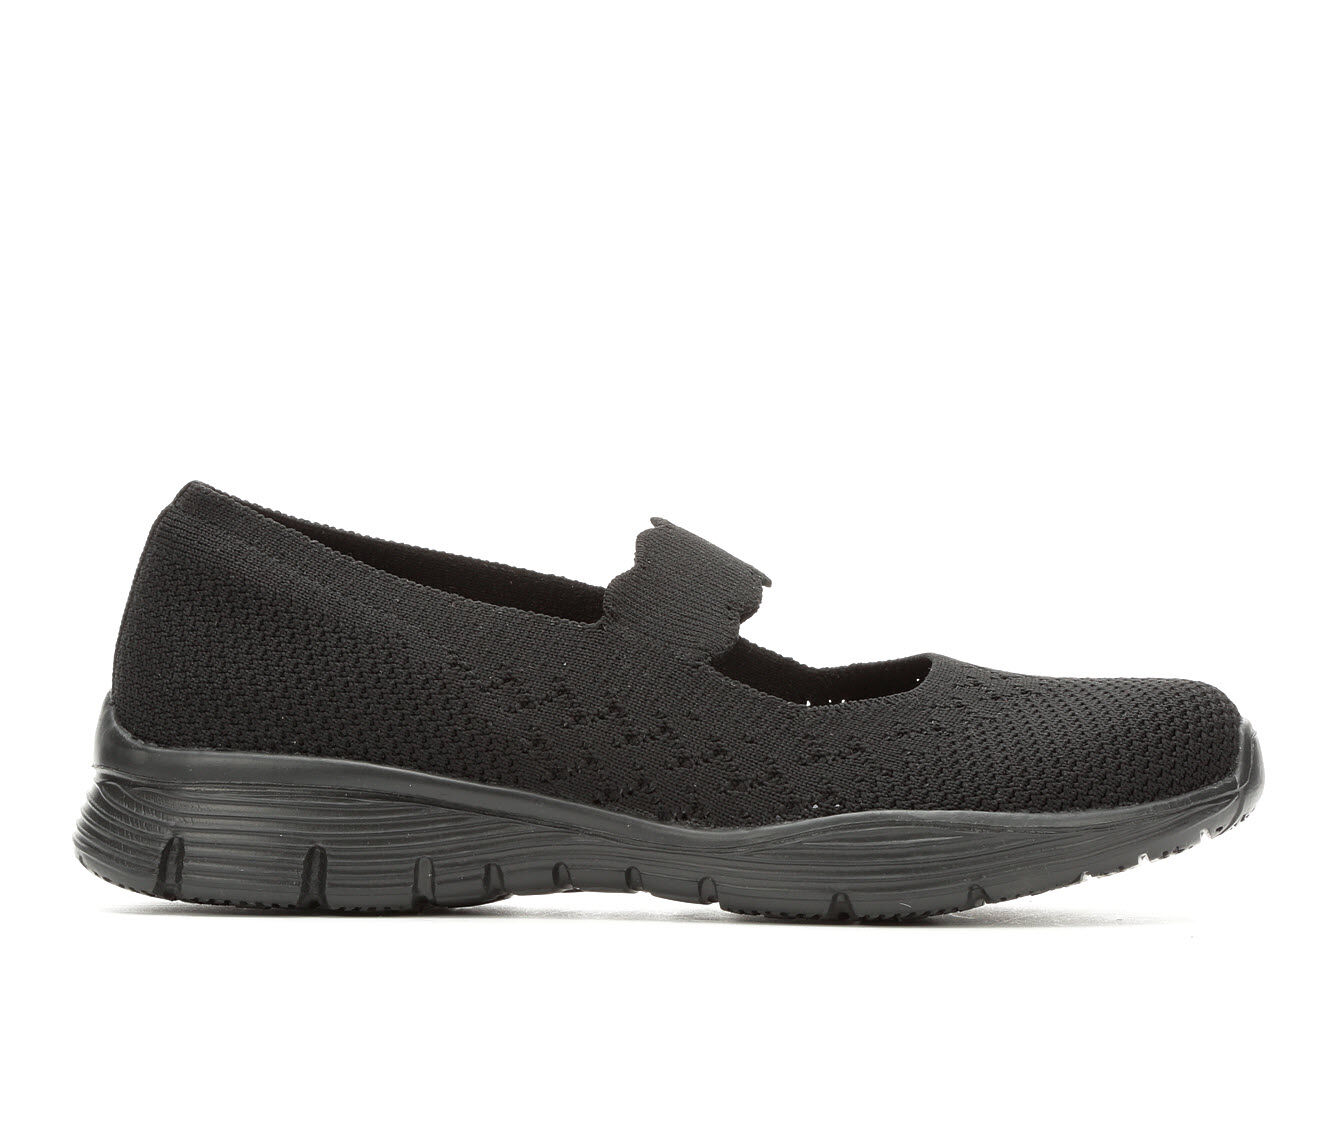 Special Sales Women's Skechers Power Hitter 49622 Shoes Black